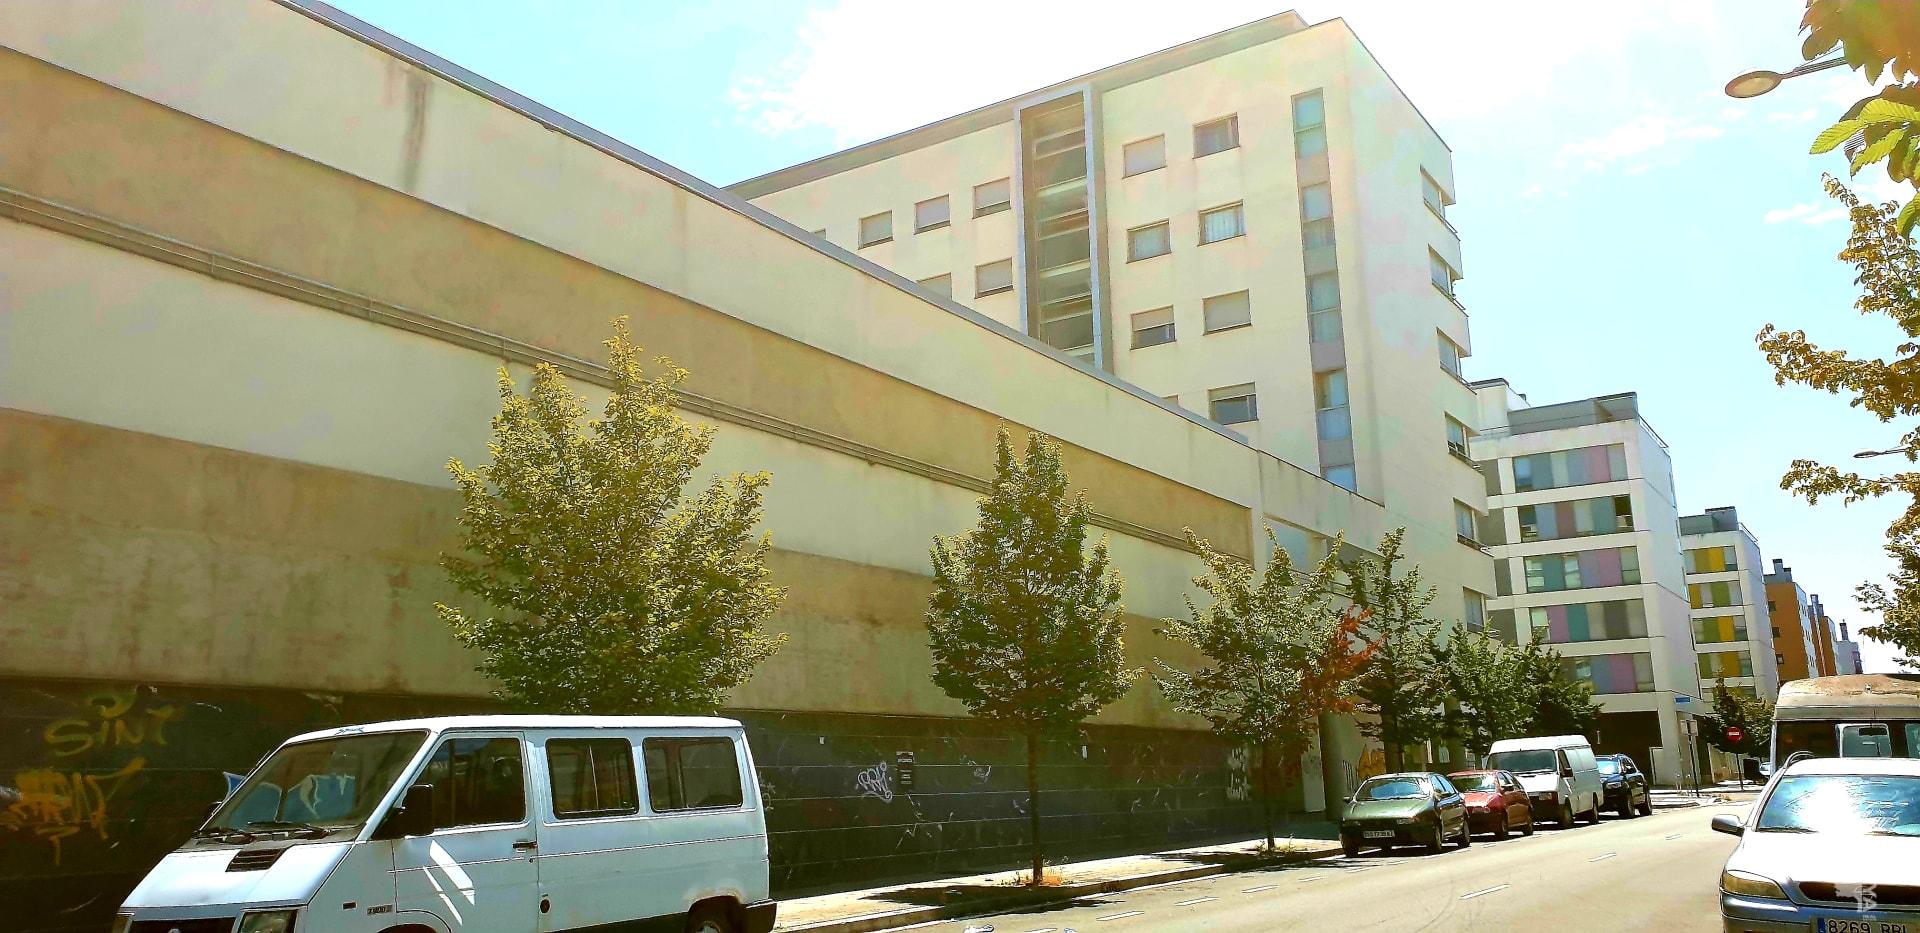 Parking en venta en Salburua, Vitoria-gasteiz, Álava, Calle Viena, 6.100 €, 27 m2